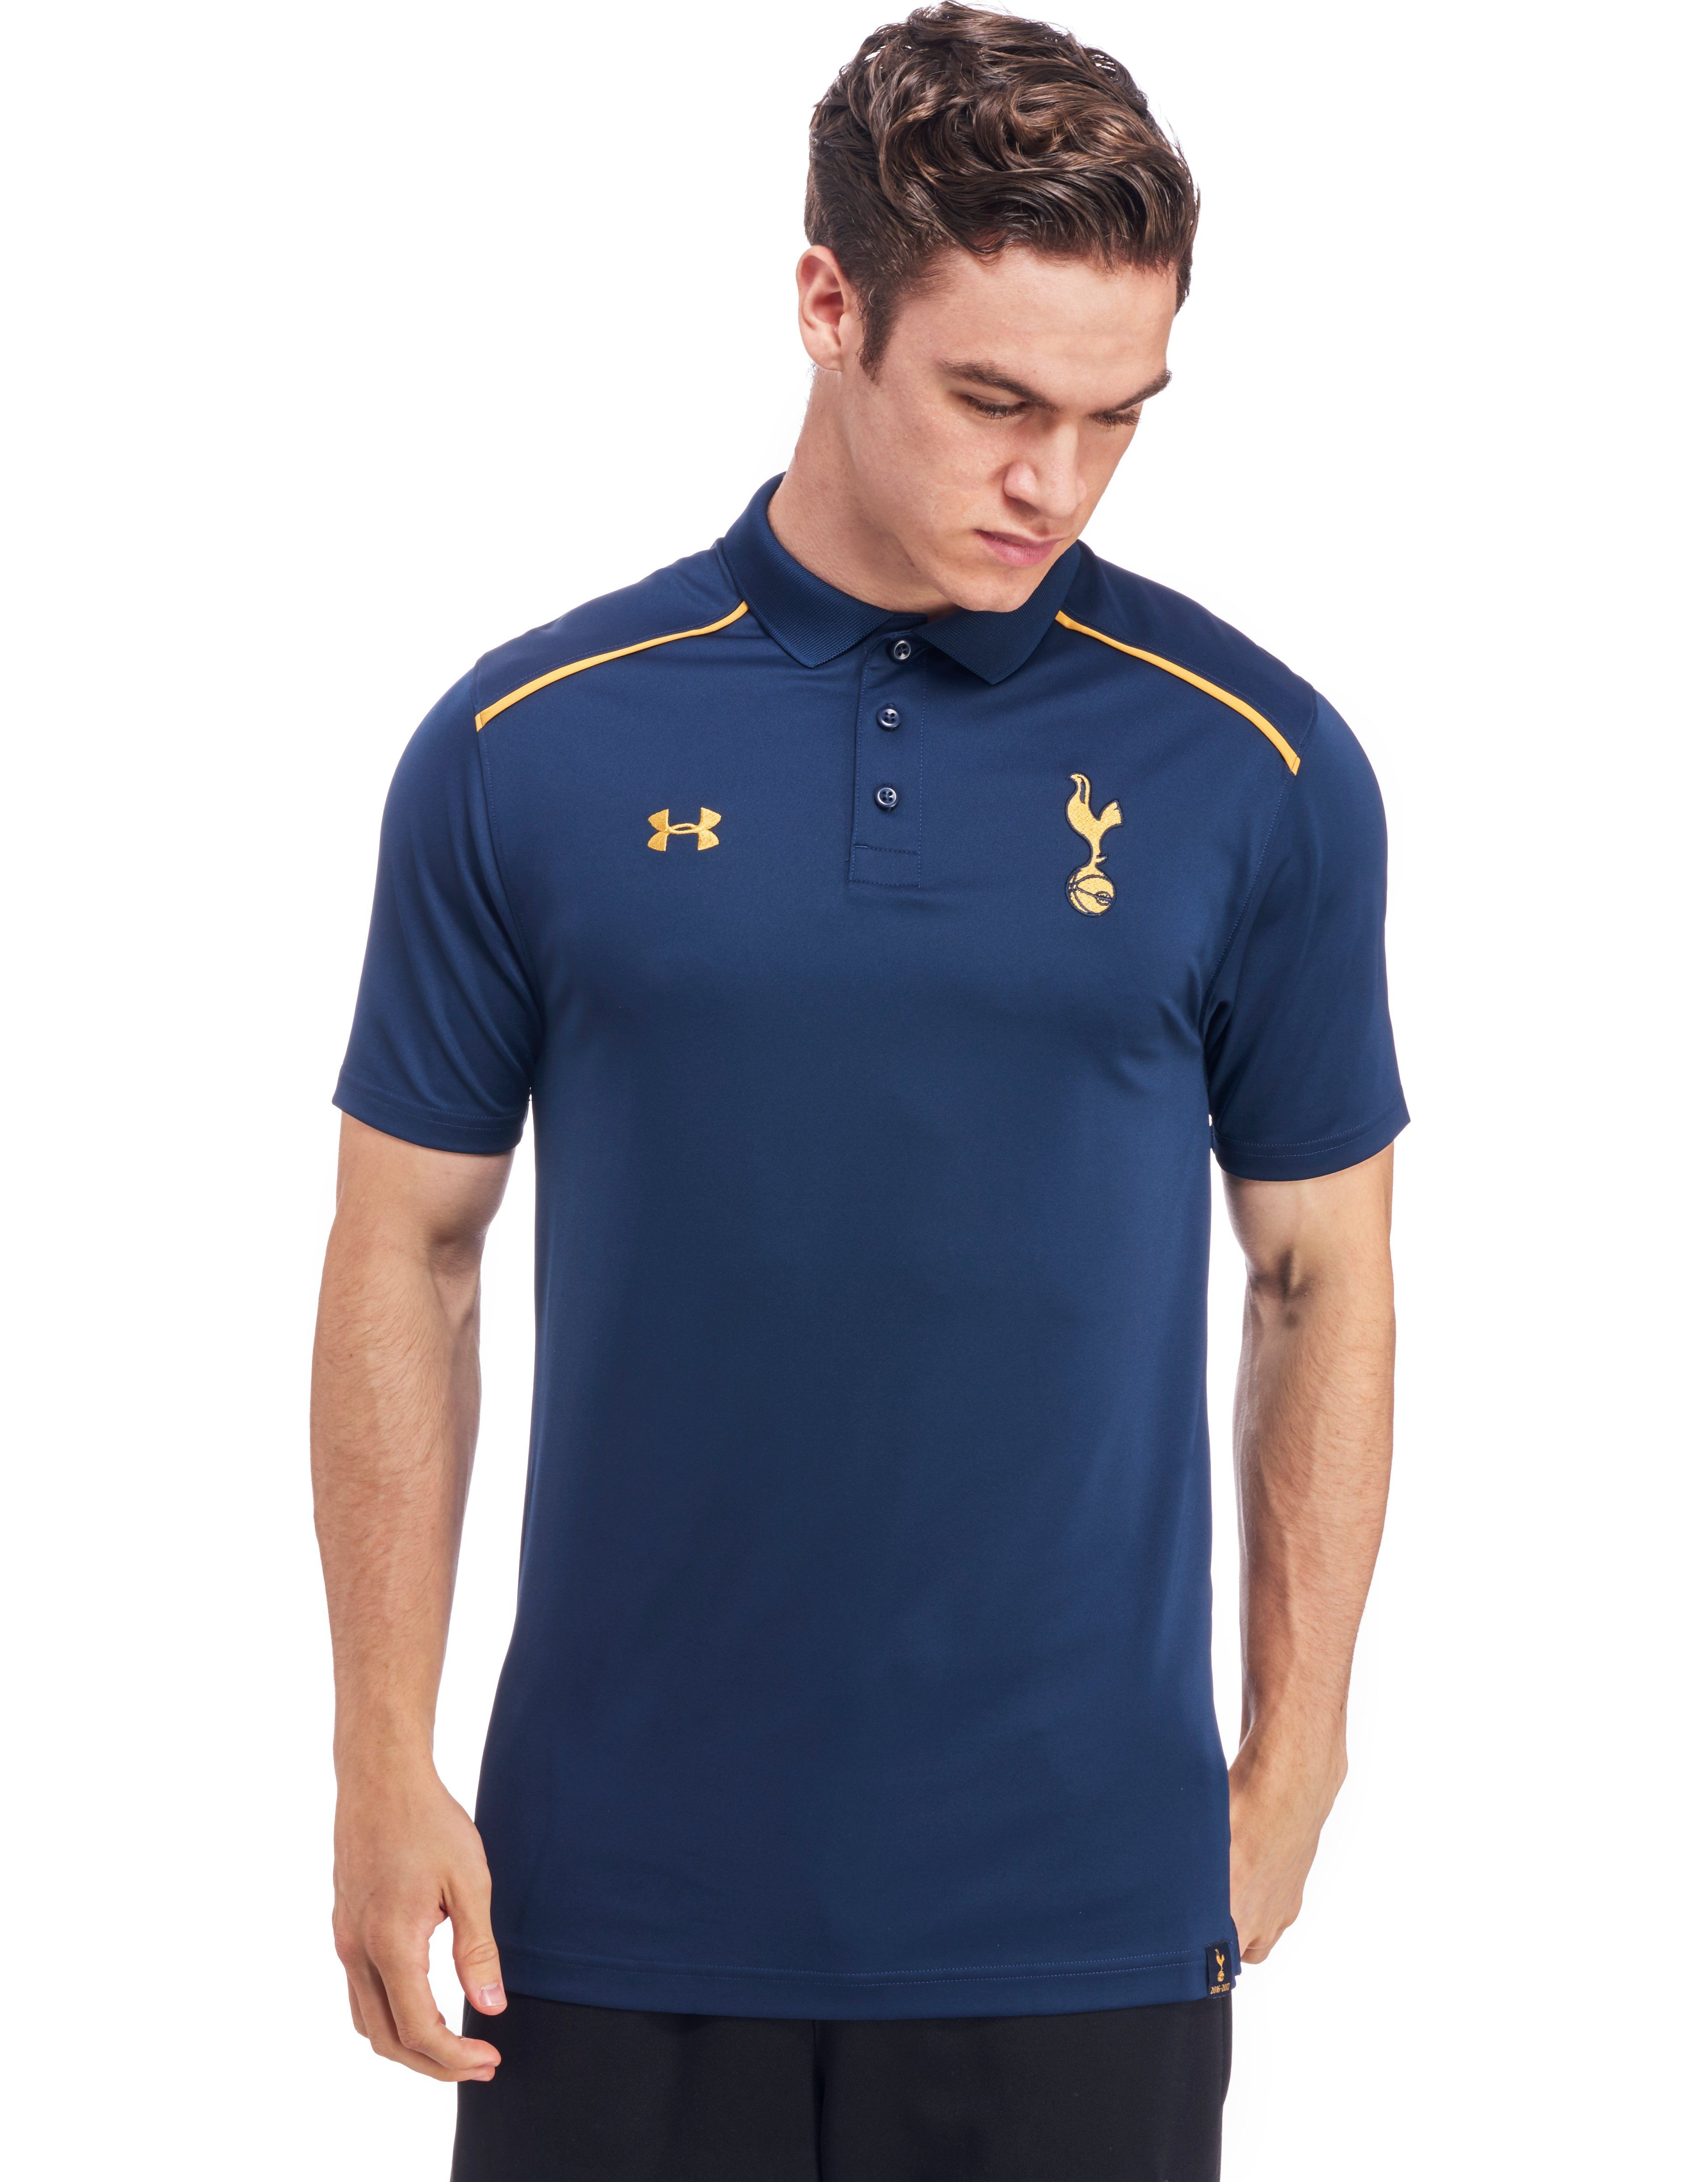 Under armour tottenham hotspur 2016 17 team polo shirt for Tottenham under armour polo shirt